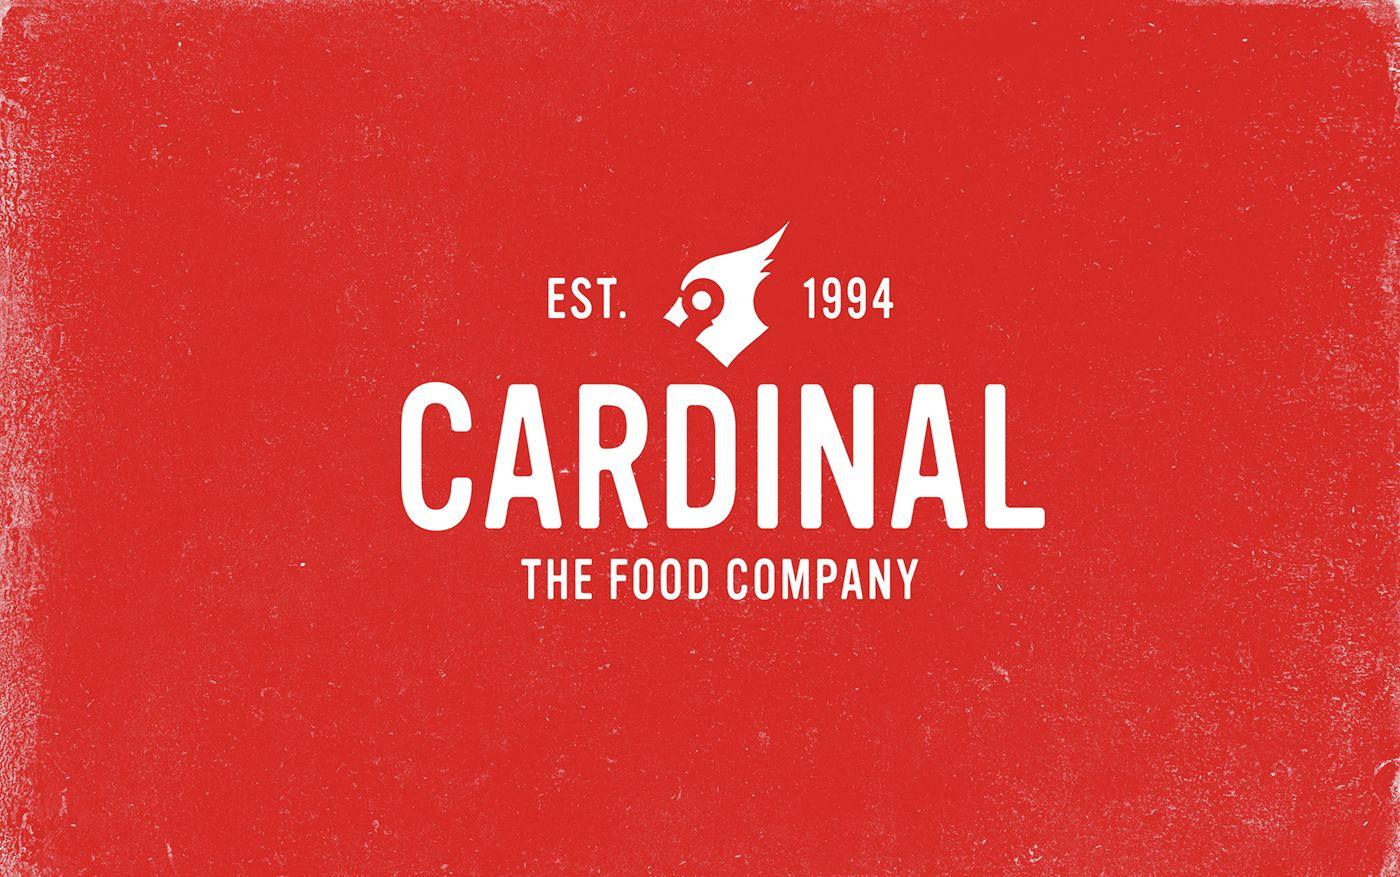 Cardinal The Food Company Brand Identity Packaging On Behance Brand Identity Packaging Design Inspiration Inspiration